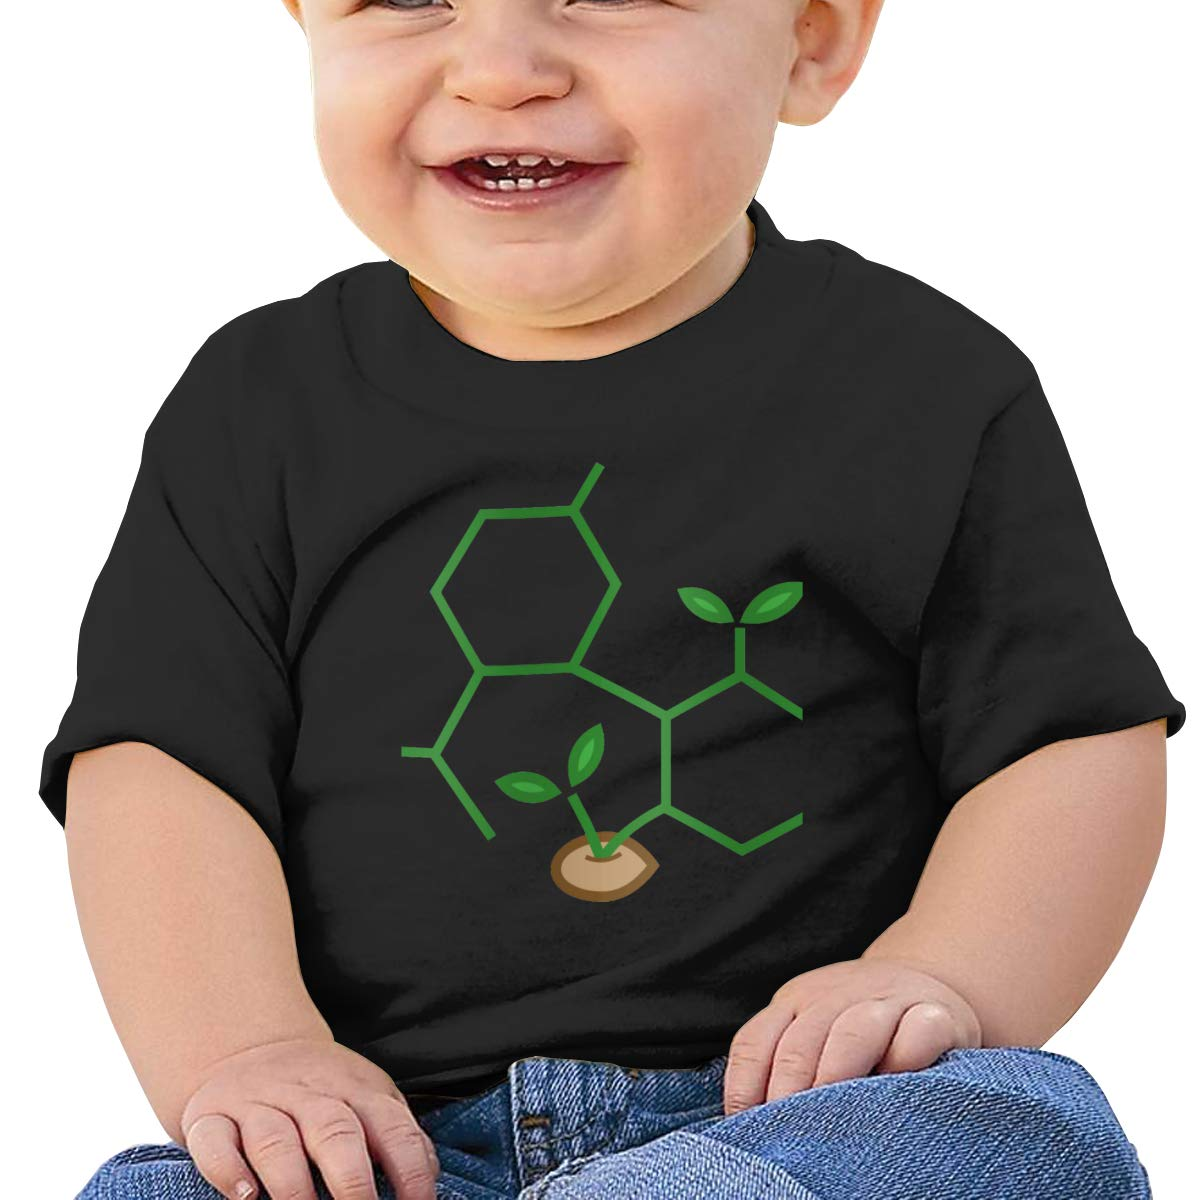 CBD Molecule Cannabis Baby T-Shirt Baby Boy Girl Cotton T Shirts Soft Graphic T-Shirt for 6M-2T Baby